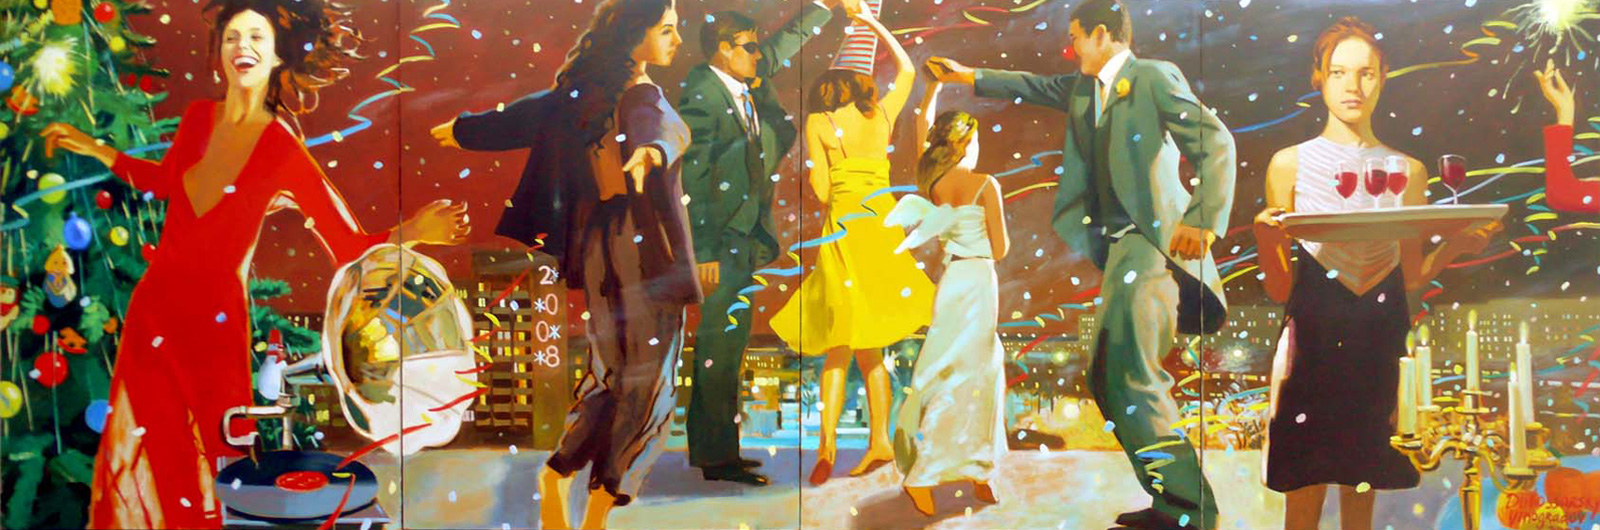 Happy Birthday  2008 oil on canvas, 195 x 295 cm . Vladimir Dubossarsky and Alexander Vinogradov